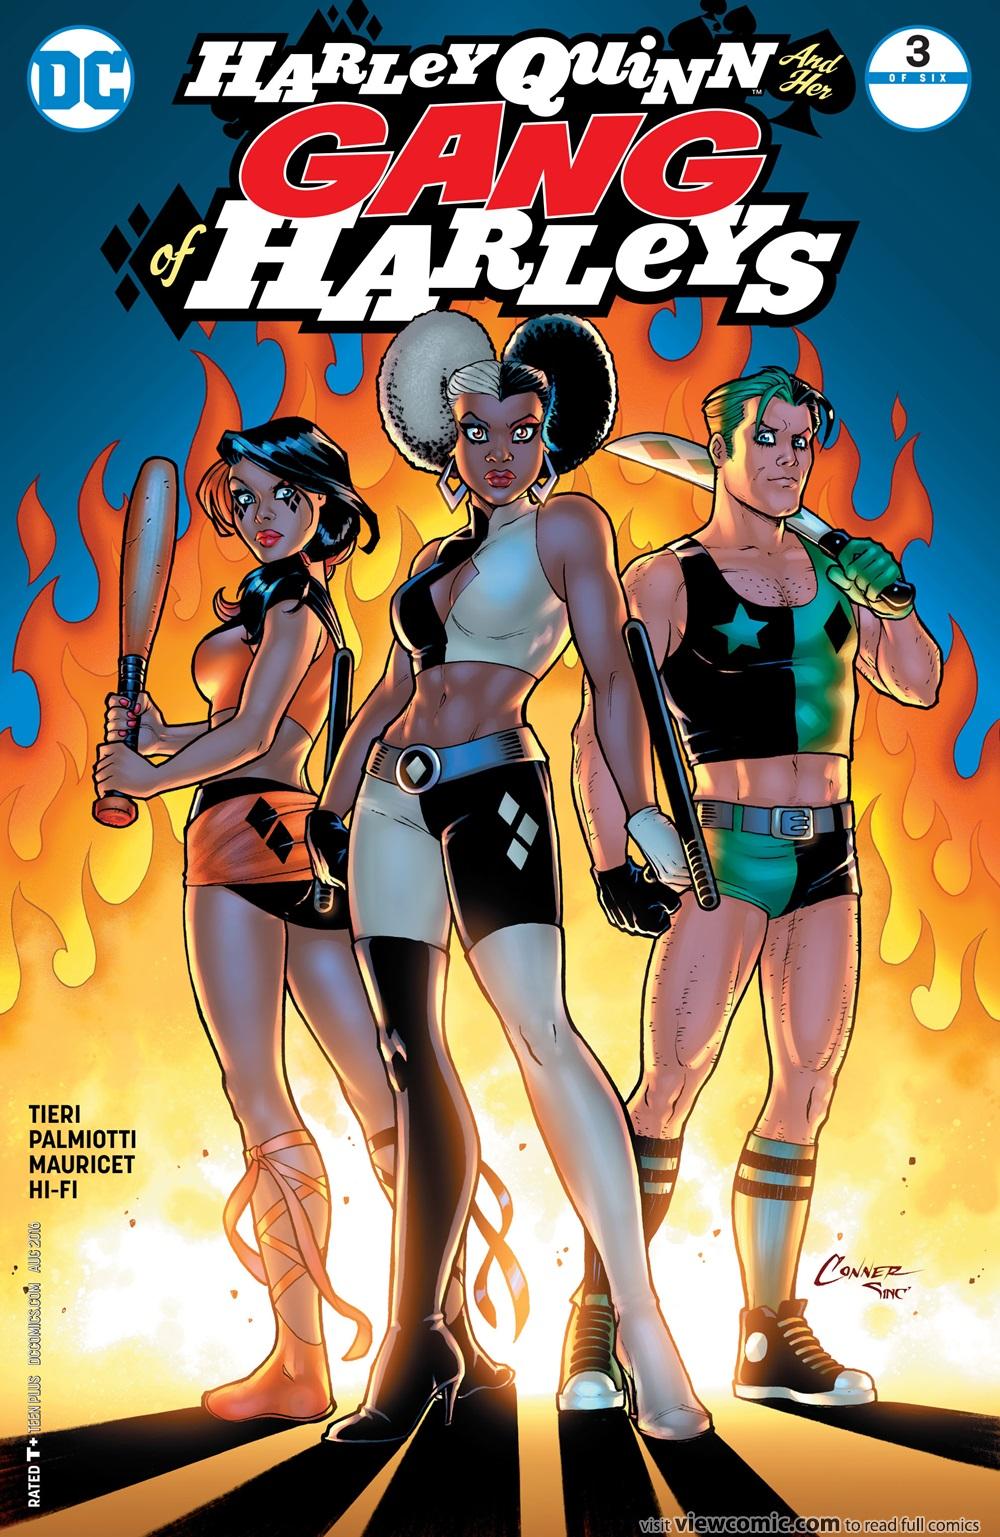 Harley Quinn & Her Gang of Harleys